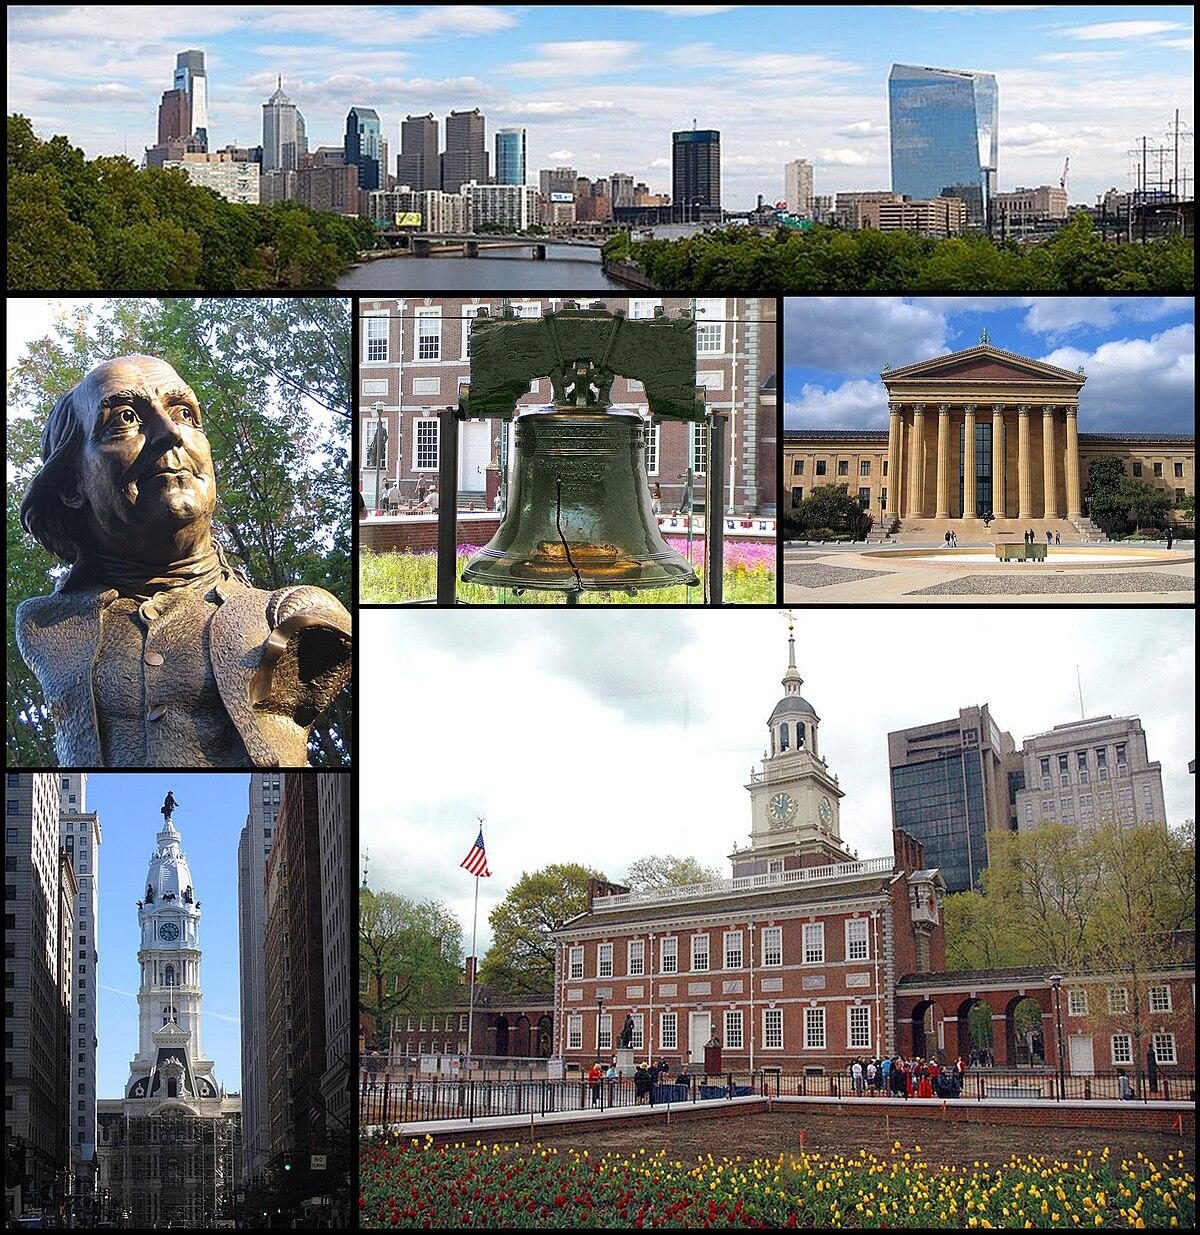 Filadelfia - Wikipedia, la enciclopedia libre